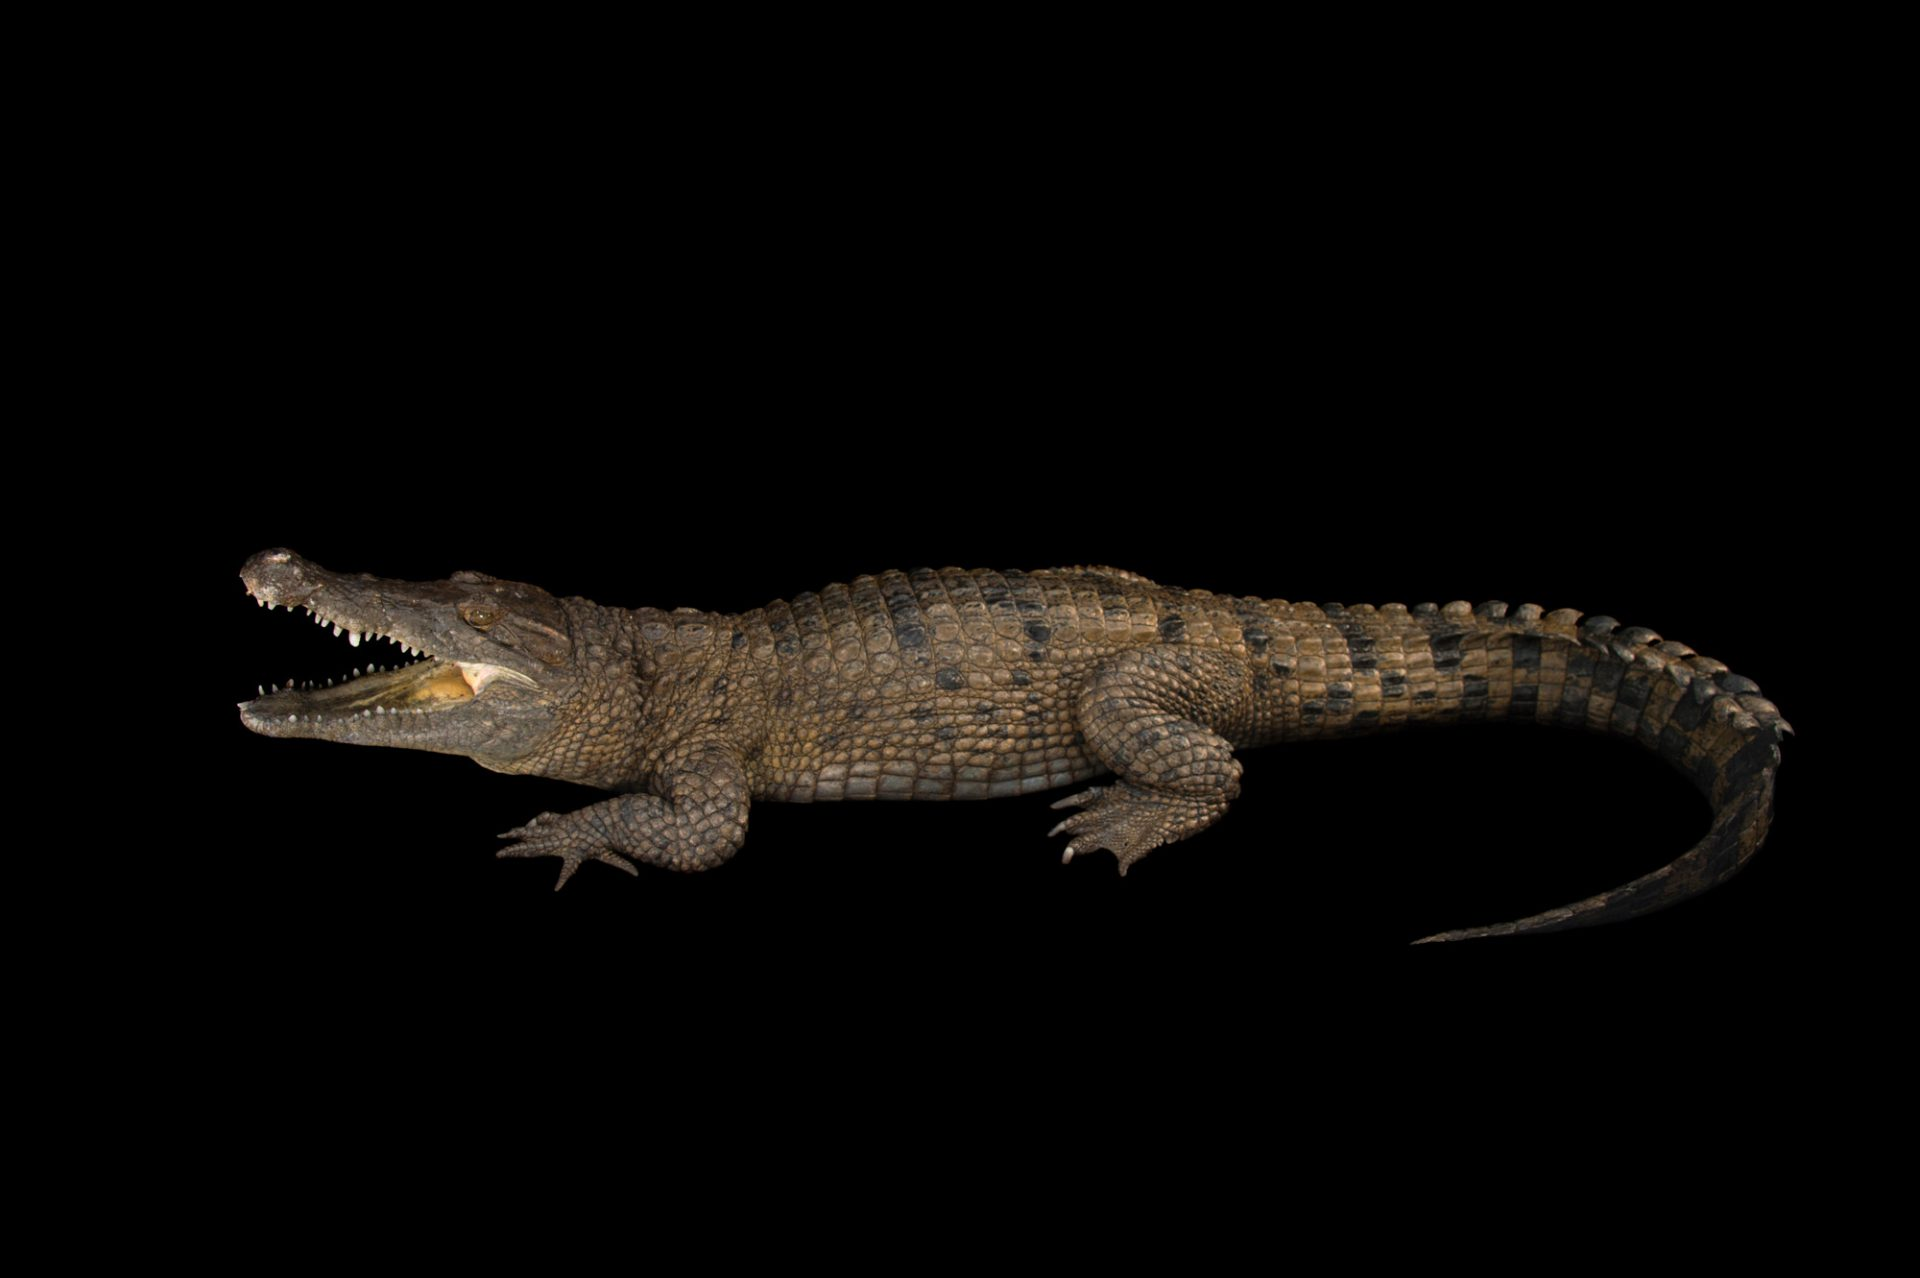 Hall's New Guinea crocodile (Crocodylus halli) at the St. Augustine Alligator Farm Zoological Park in St. Augustine, Florida.